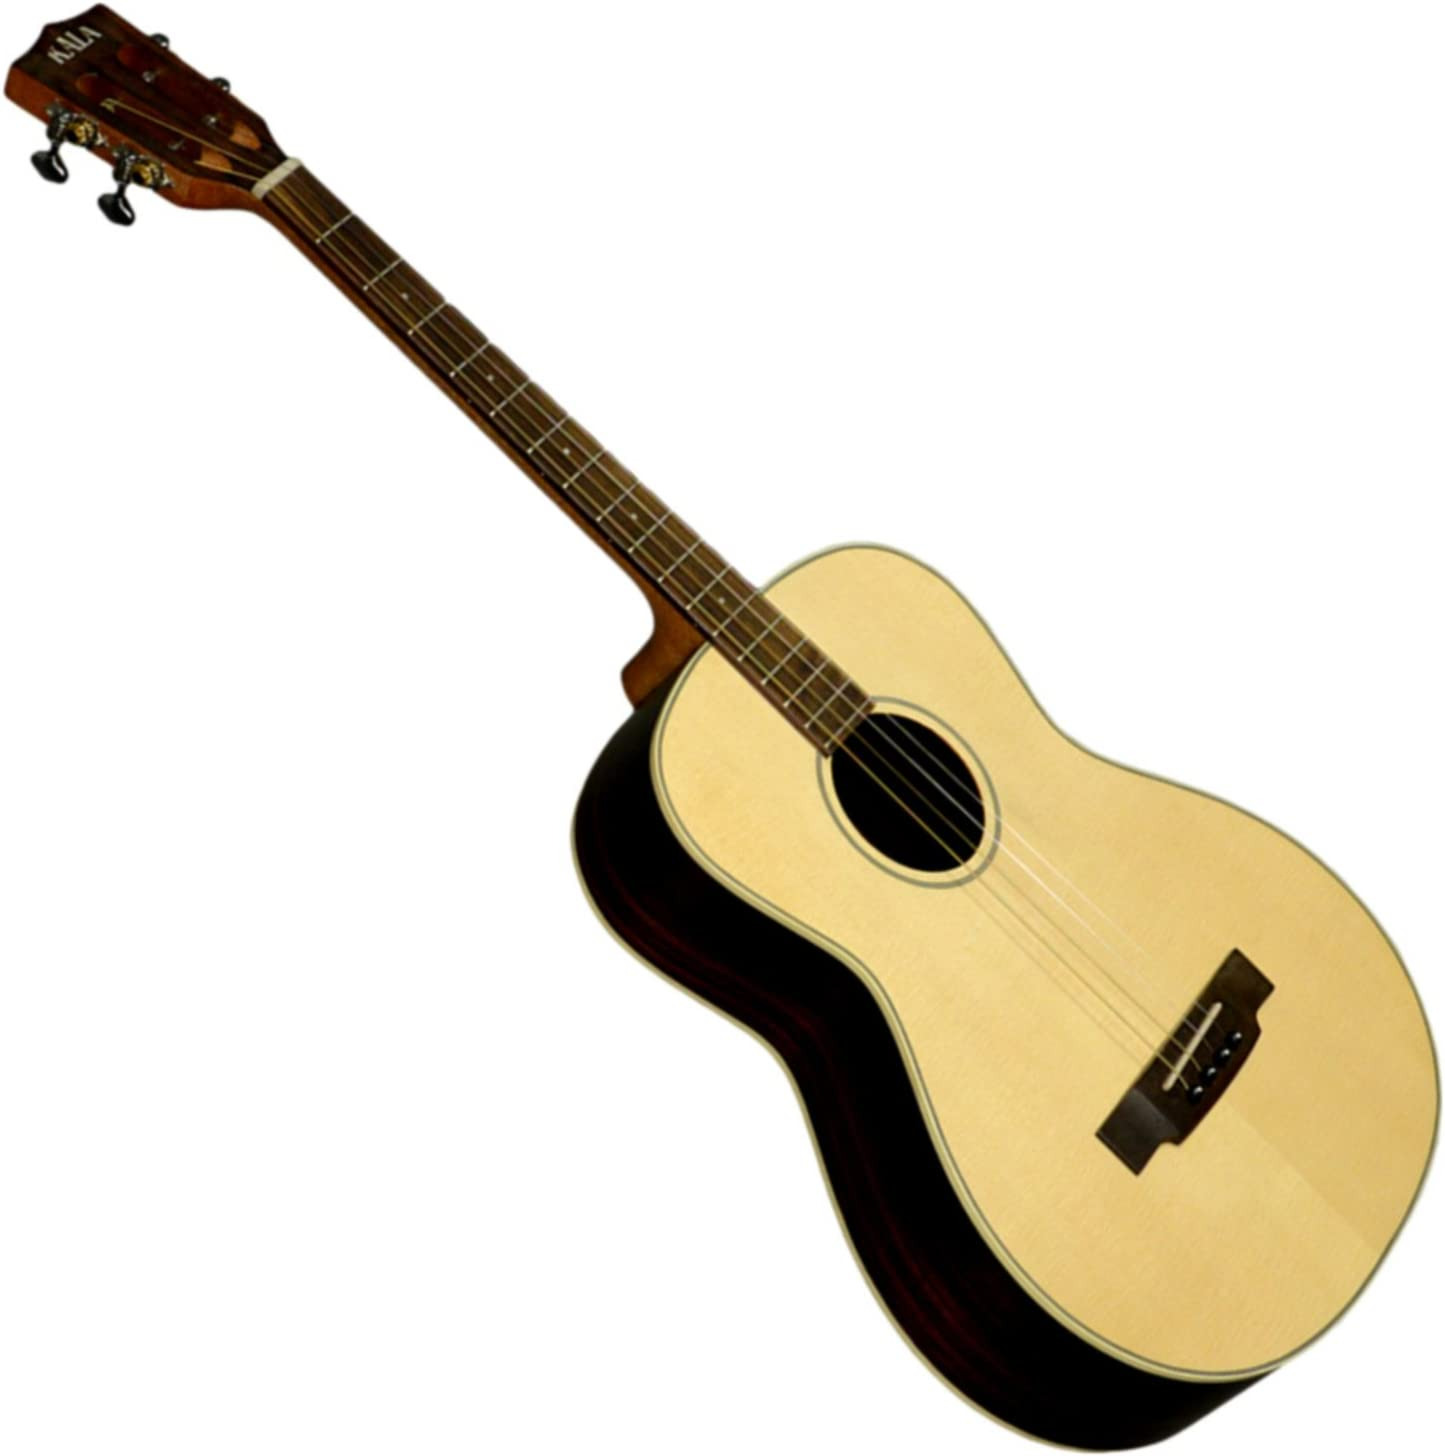 Kala guitarra Tenor KA-GTR: Amazon.es: Instrumentos musicales